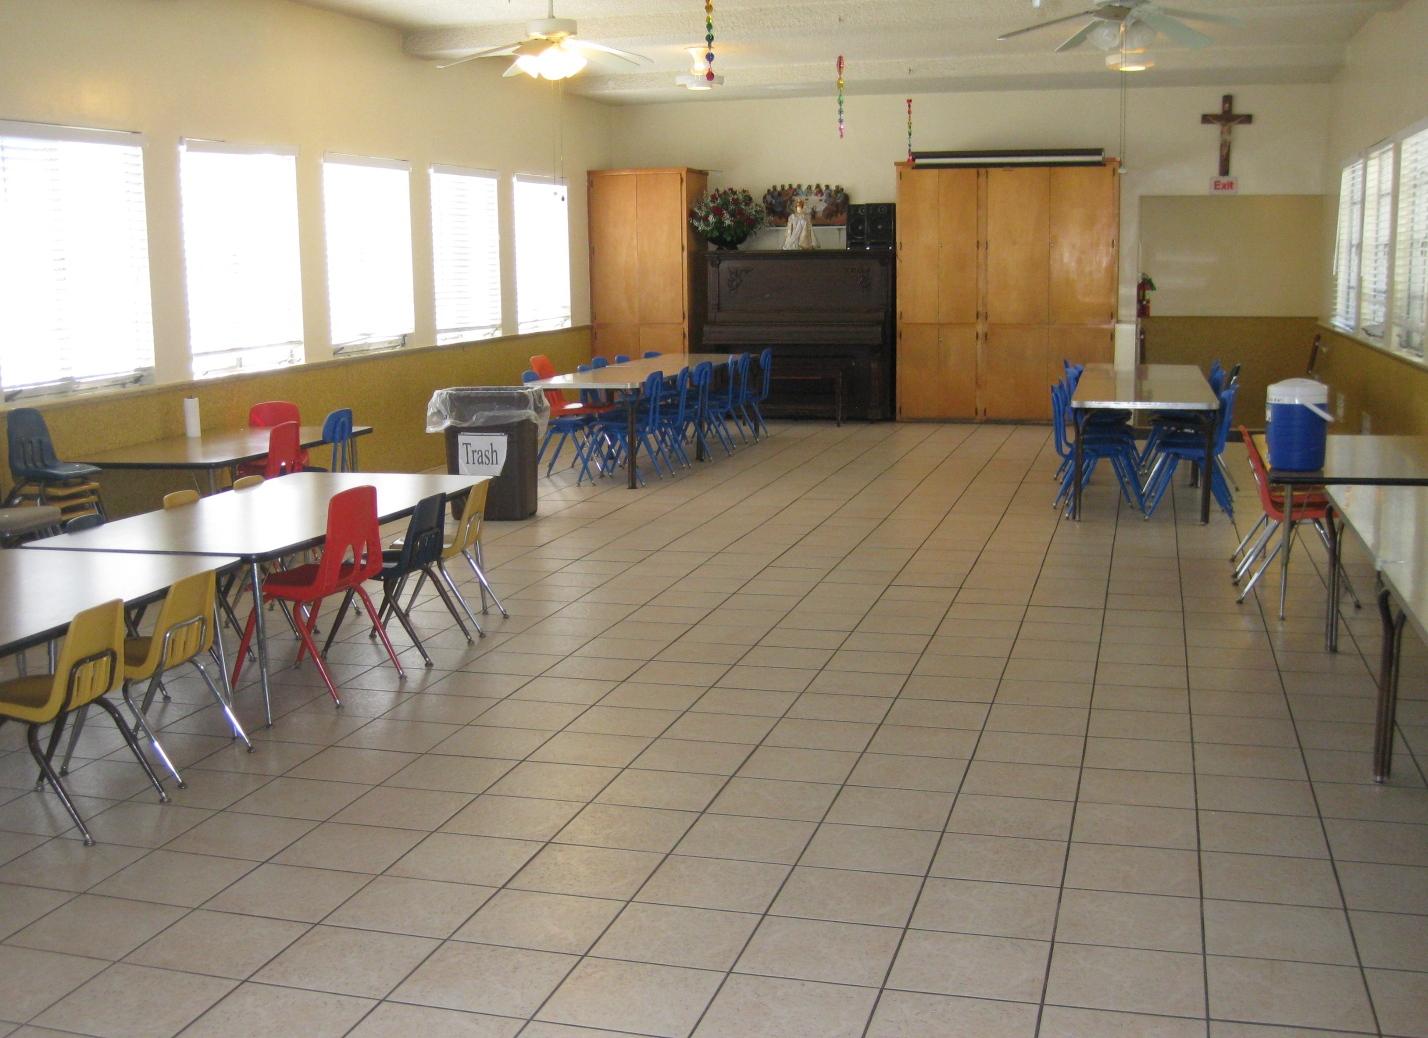 Children's Dining Room